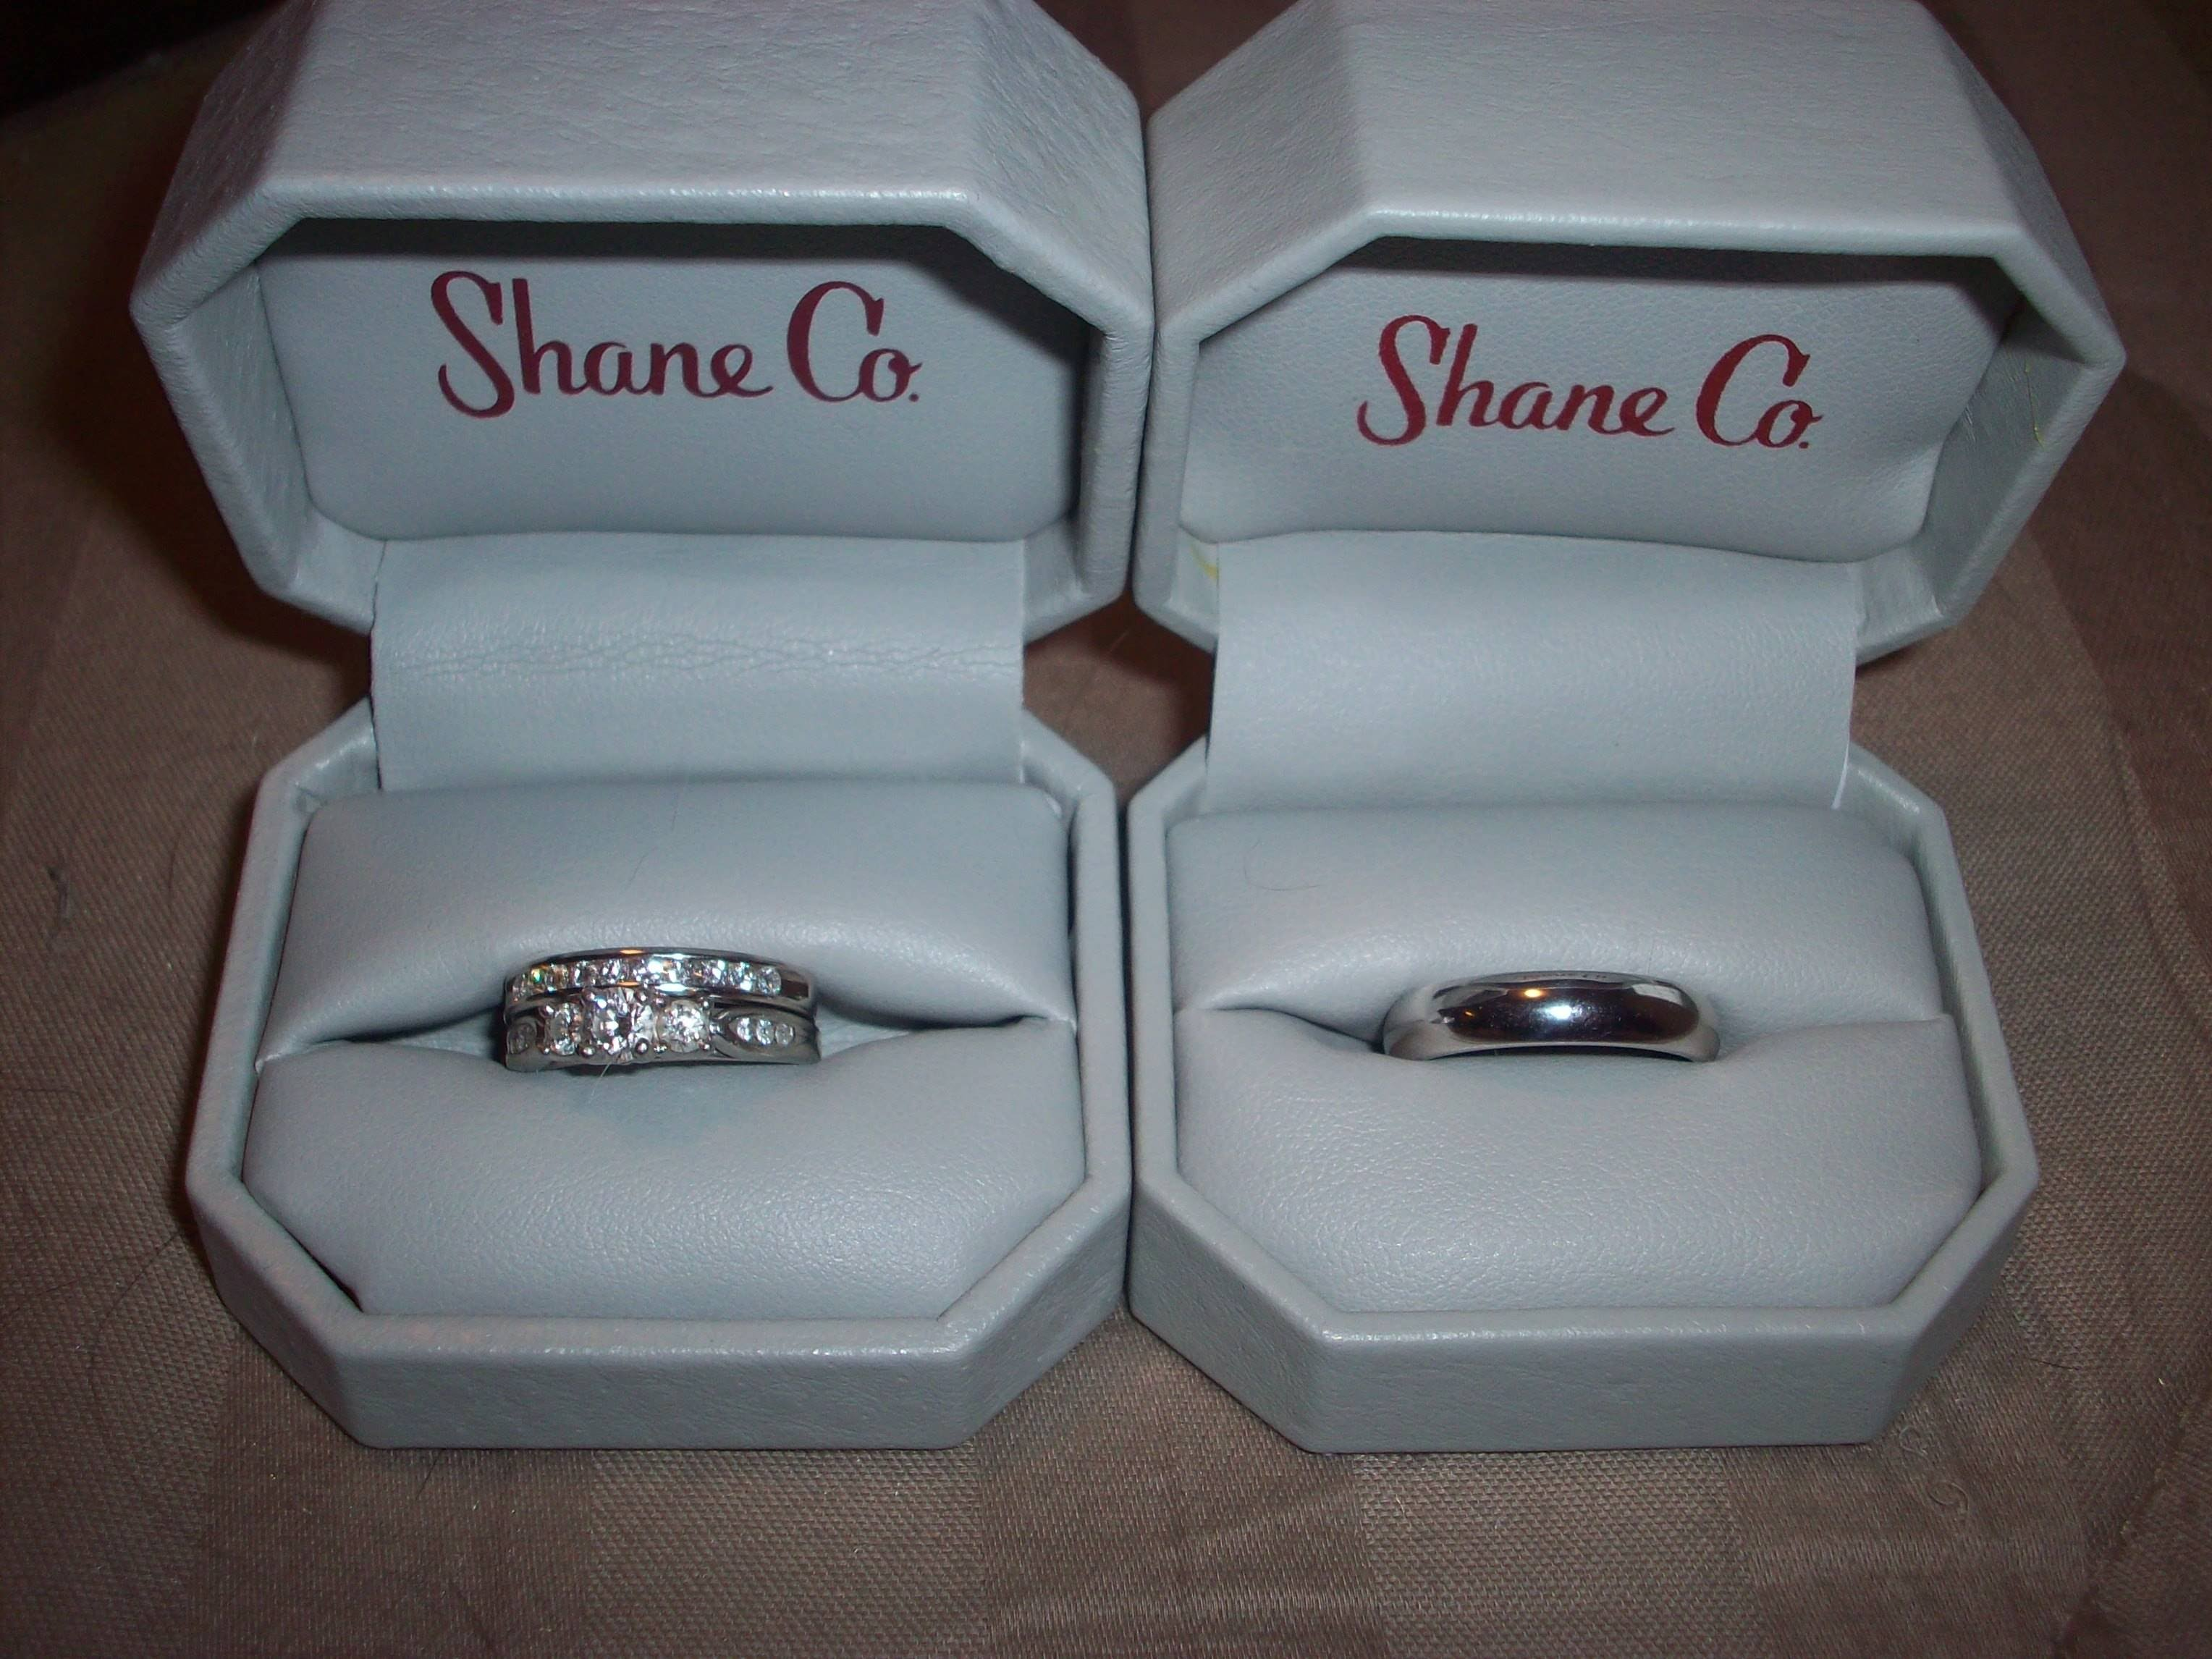 Shane Company Wedding Bands 69 Lovely We got my e